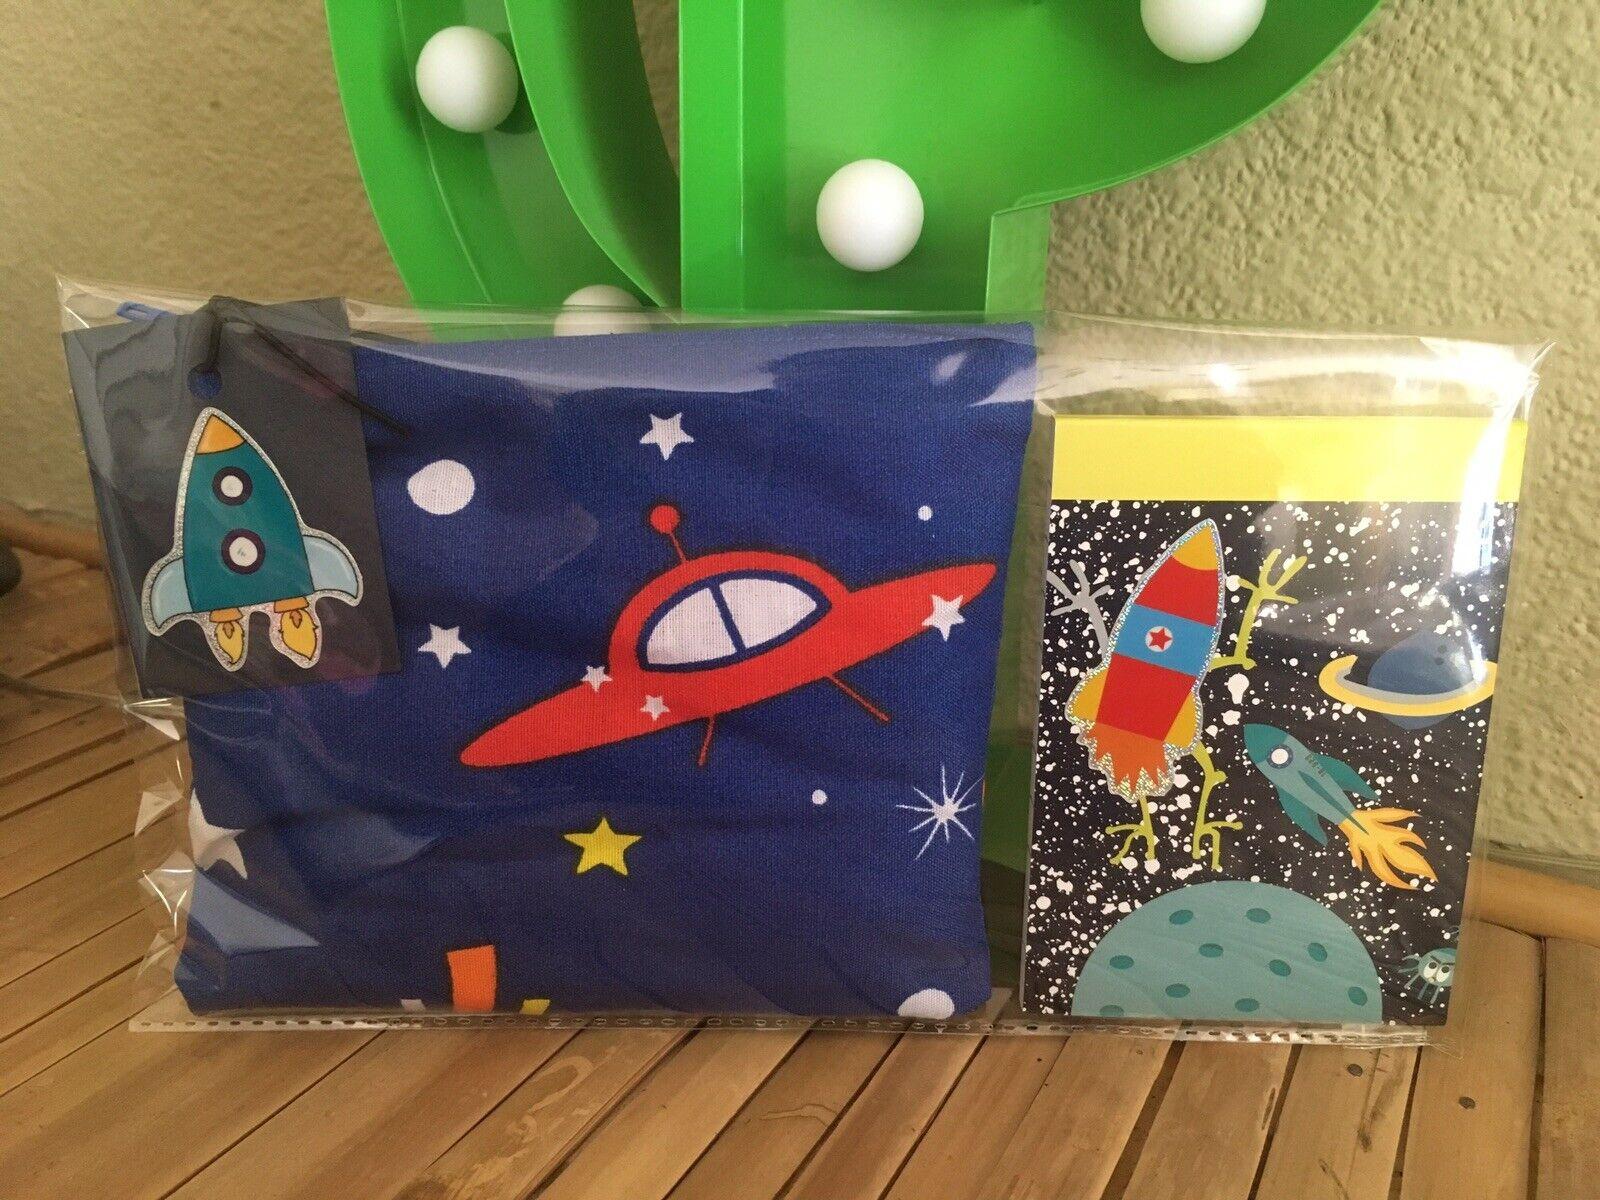 🚀Retro 50's Atomic Sputnik Rocket ship Cosmetic Bag & Notebook 2 Piece Gift Set